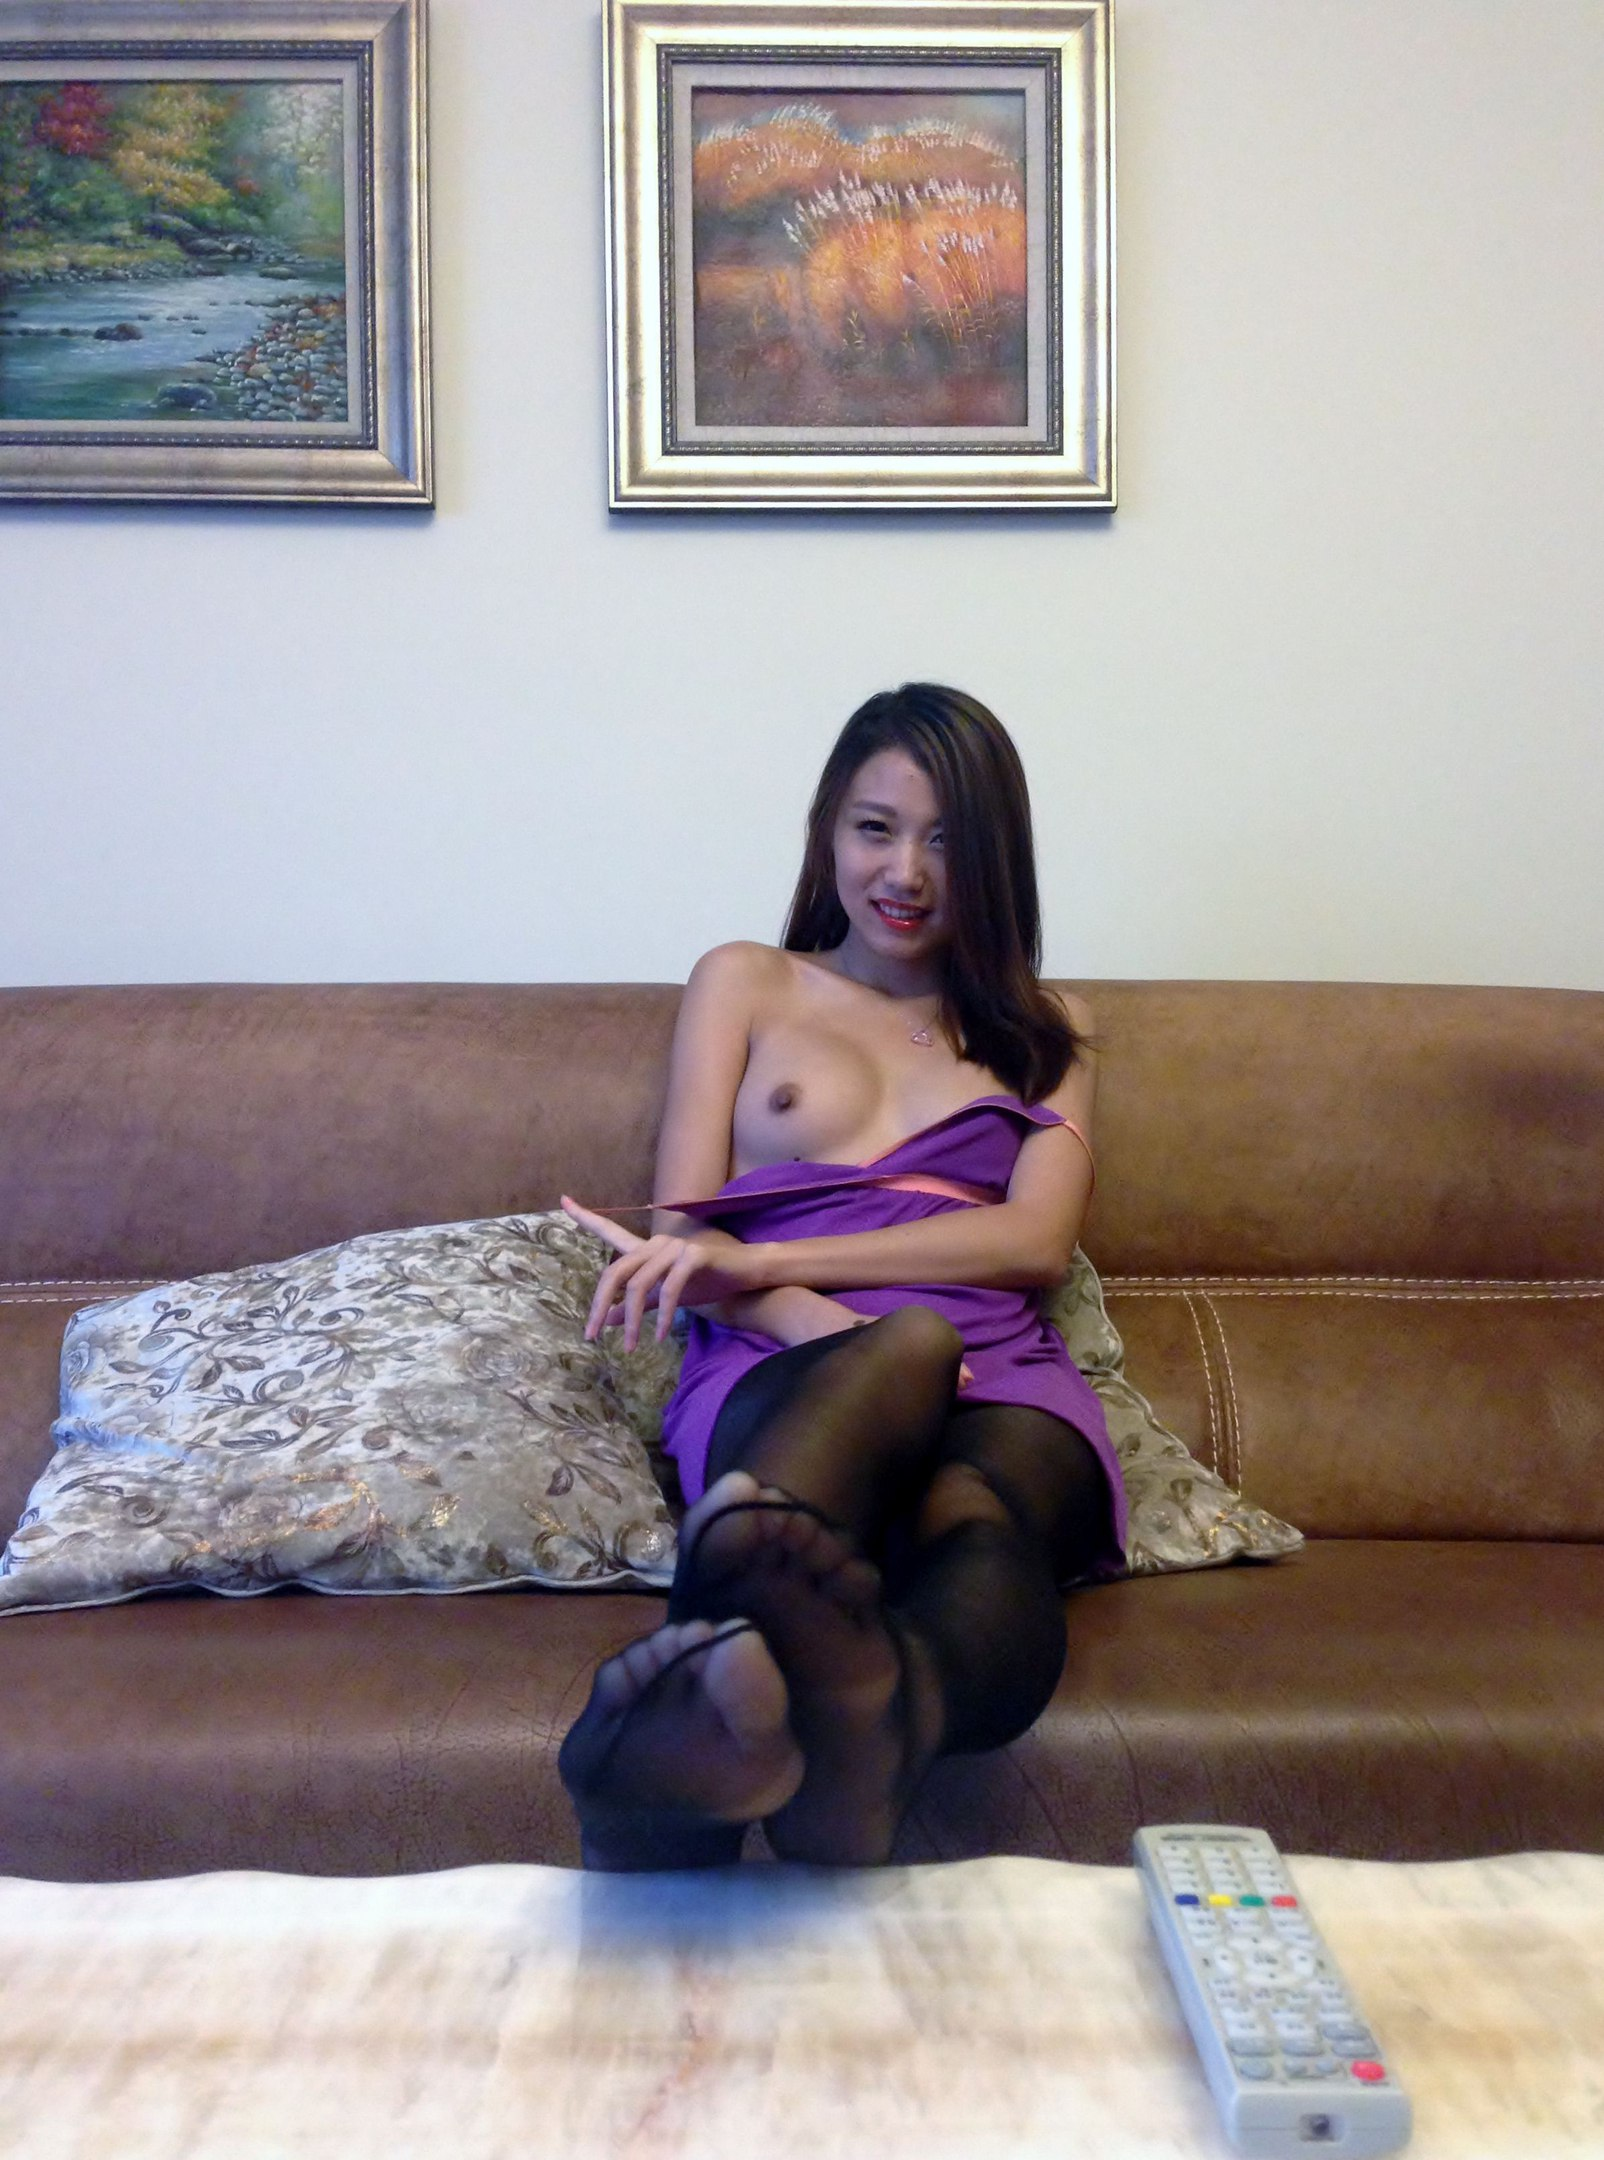 19-летняя японка стянула колготки до колен на спинке дивана секс фото